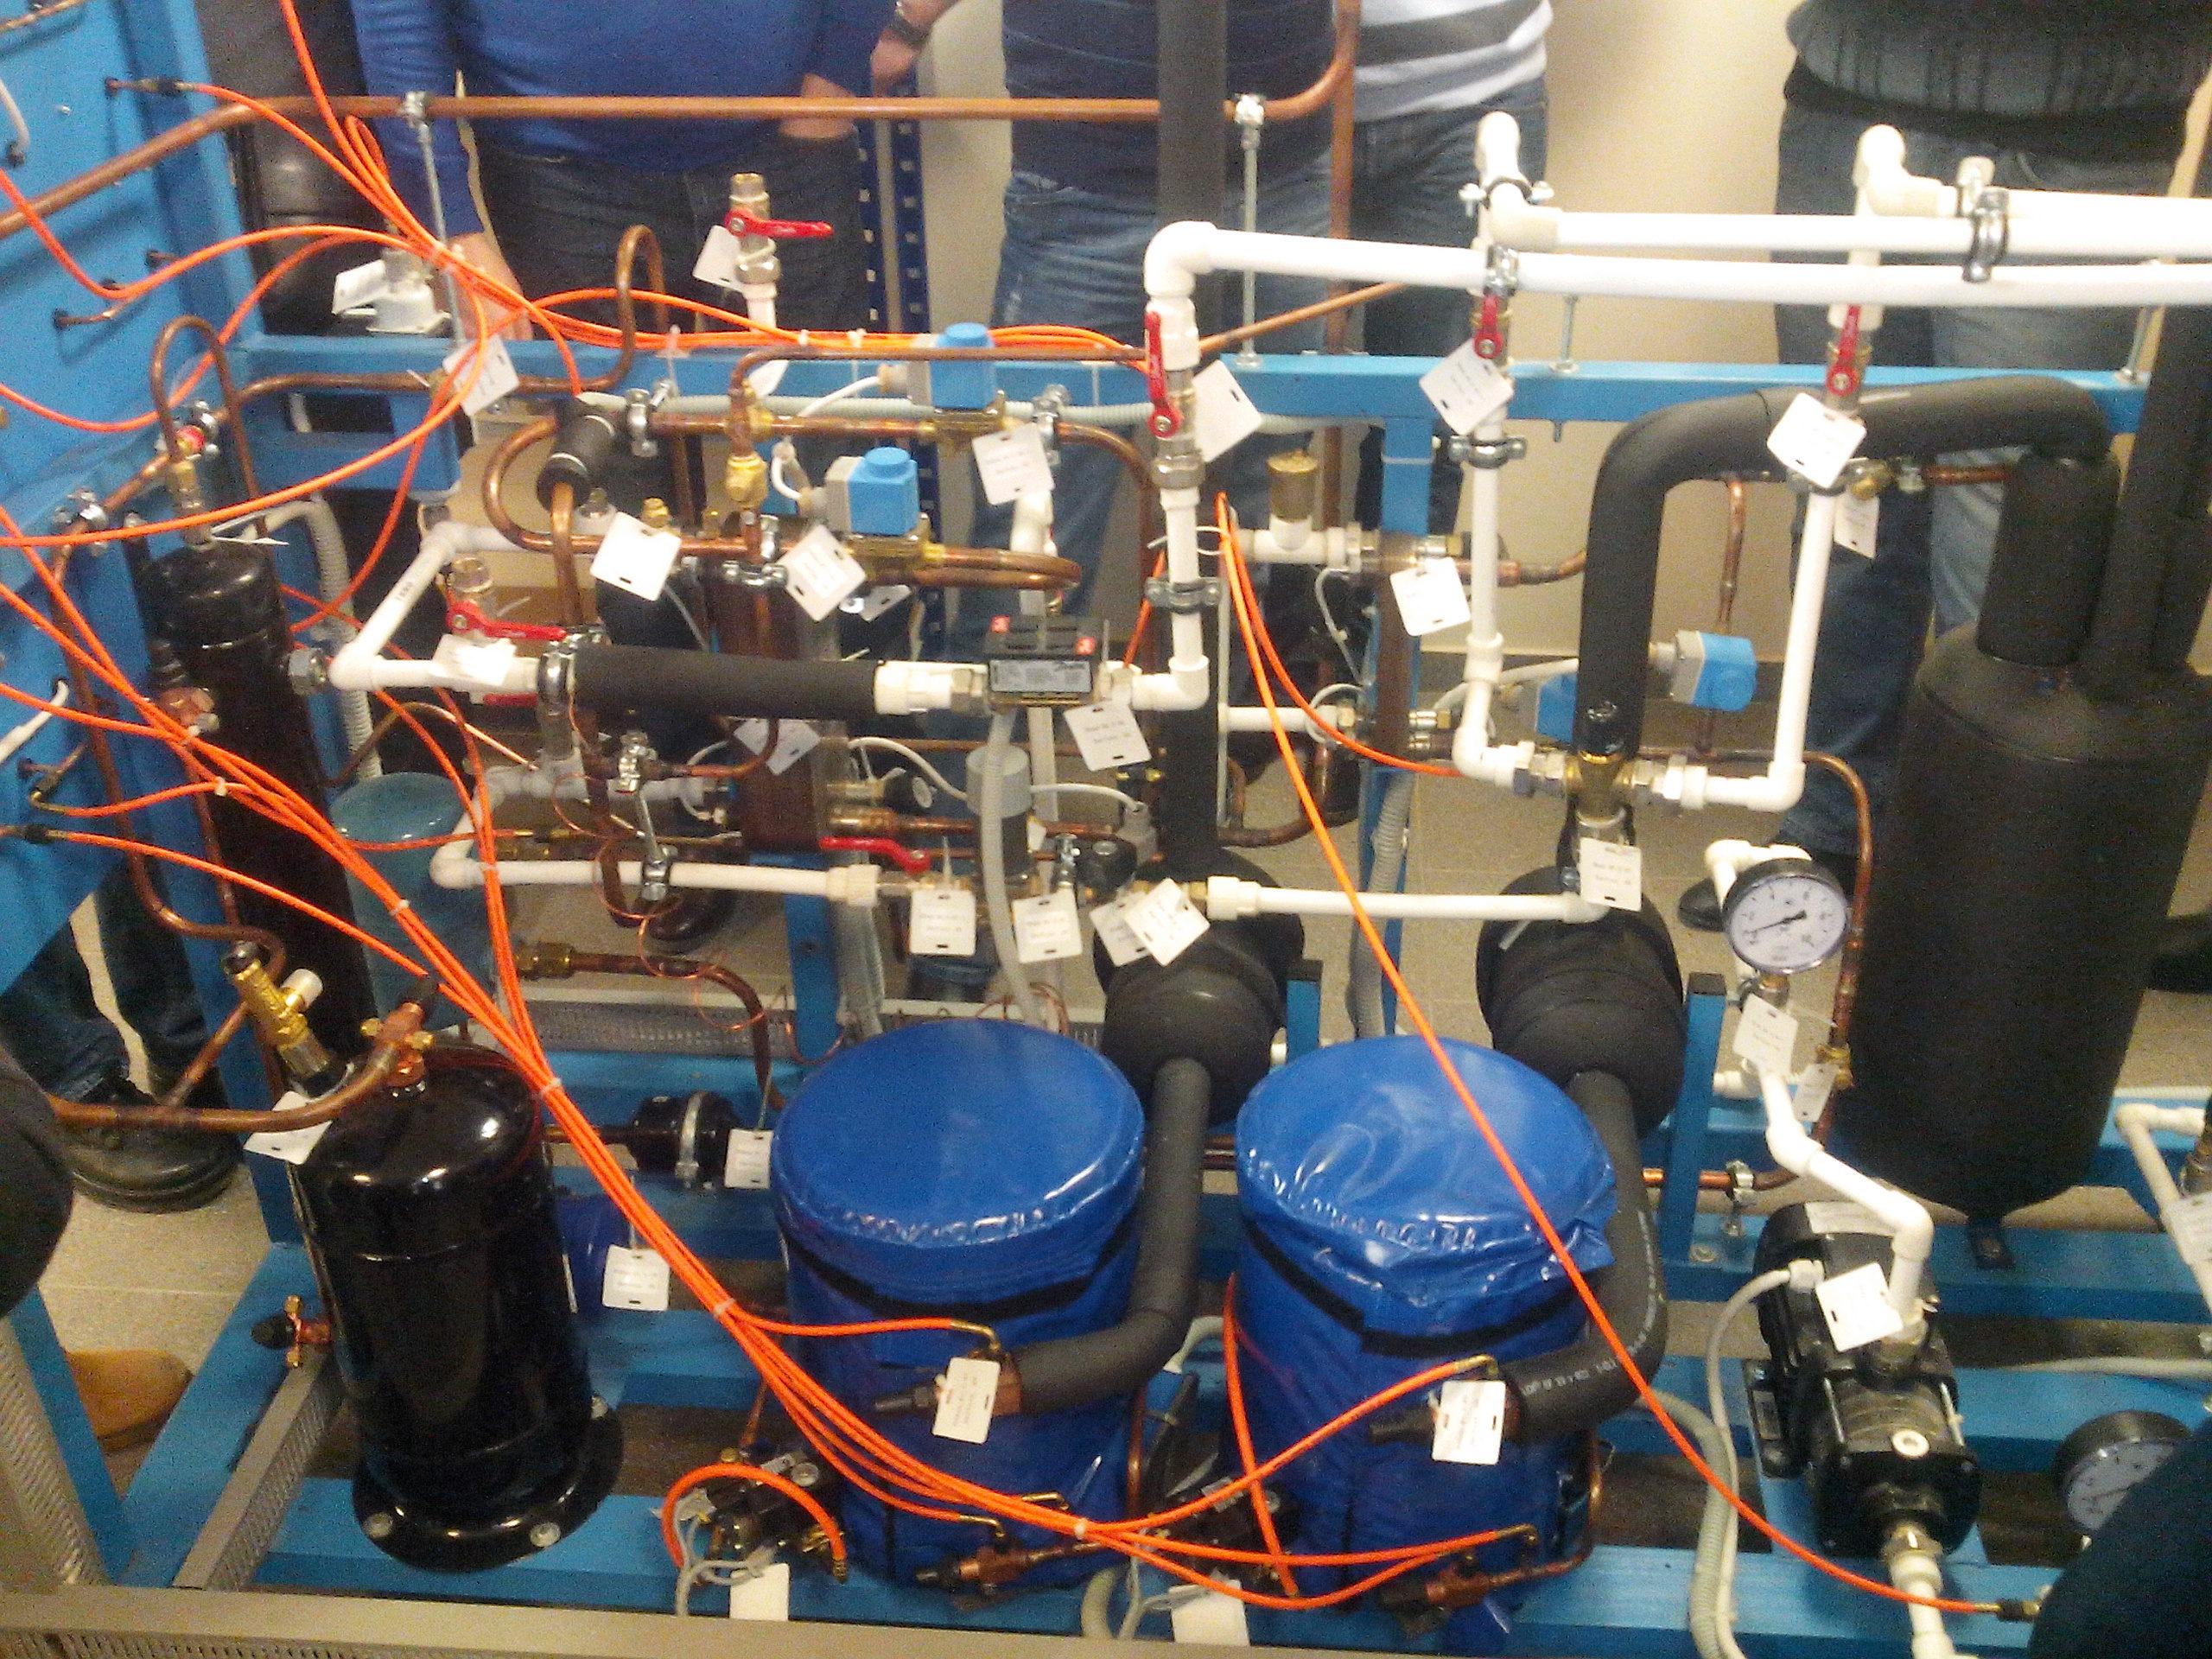 repair of industrial air conditioners